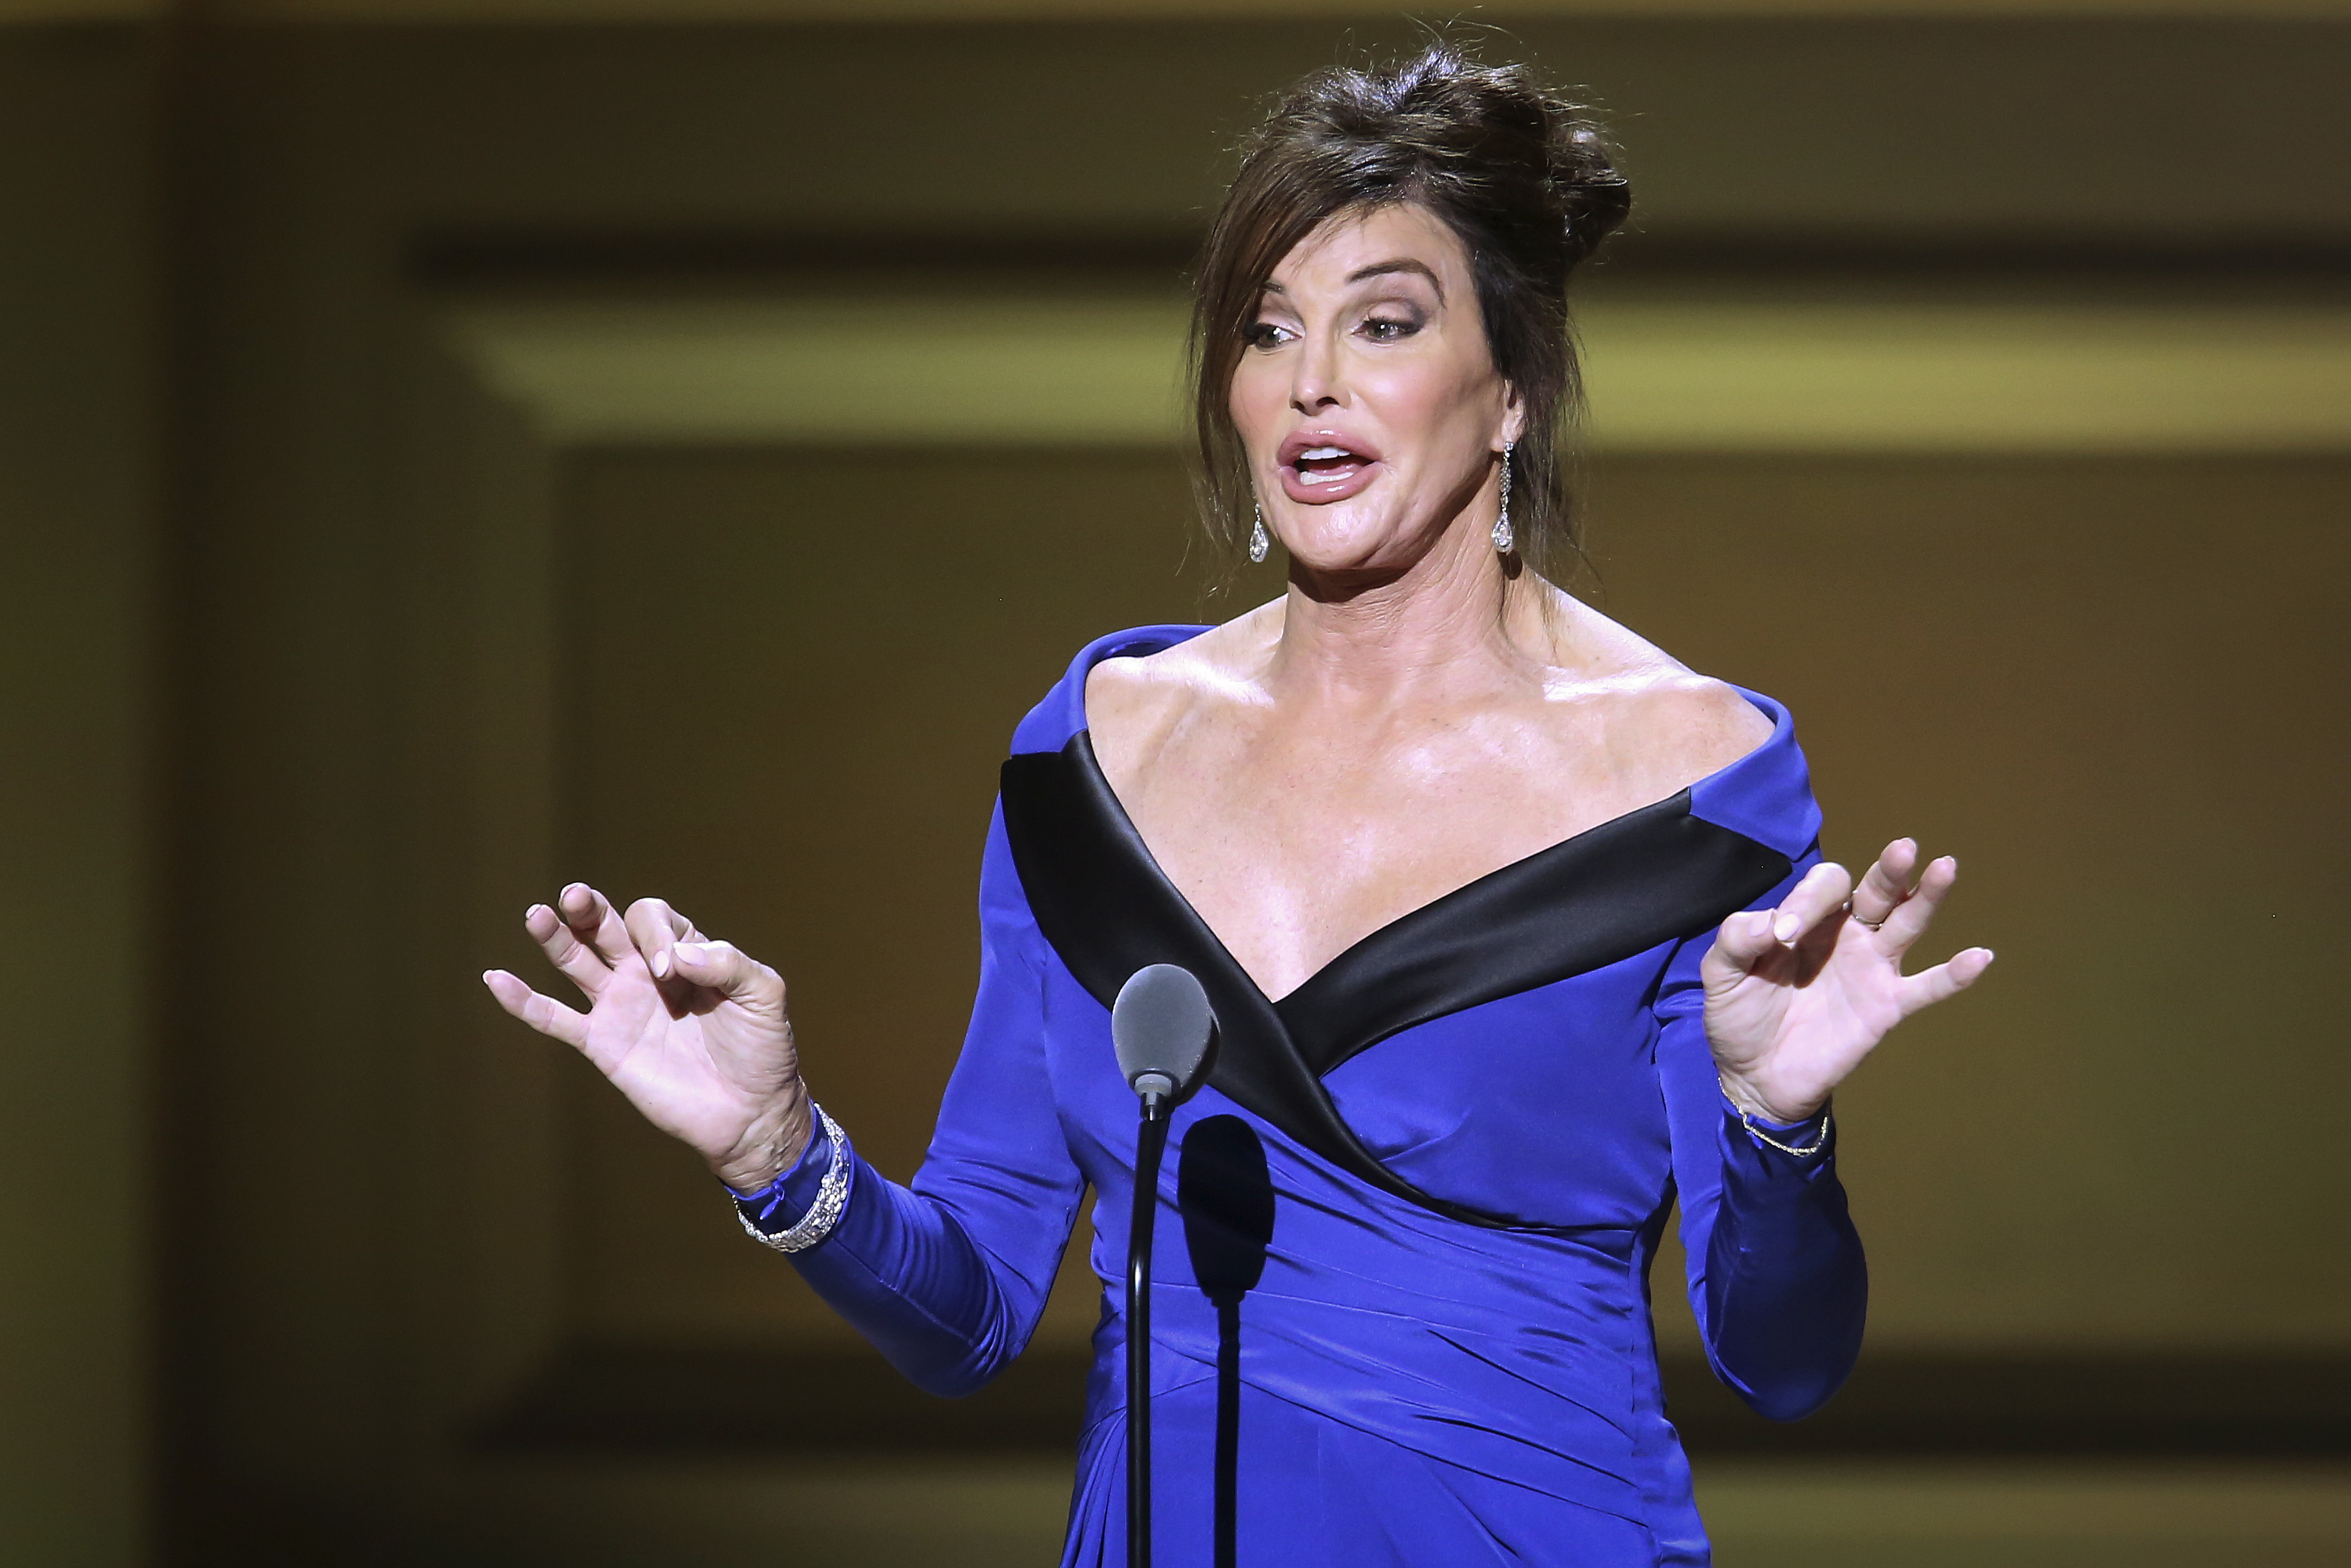 Former Olympian Caitlyn Jenner REUTERS/Carlo Allegri